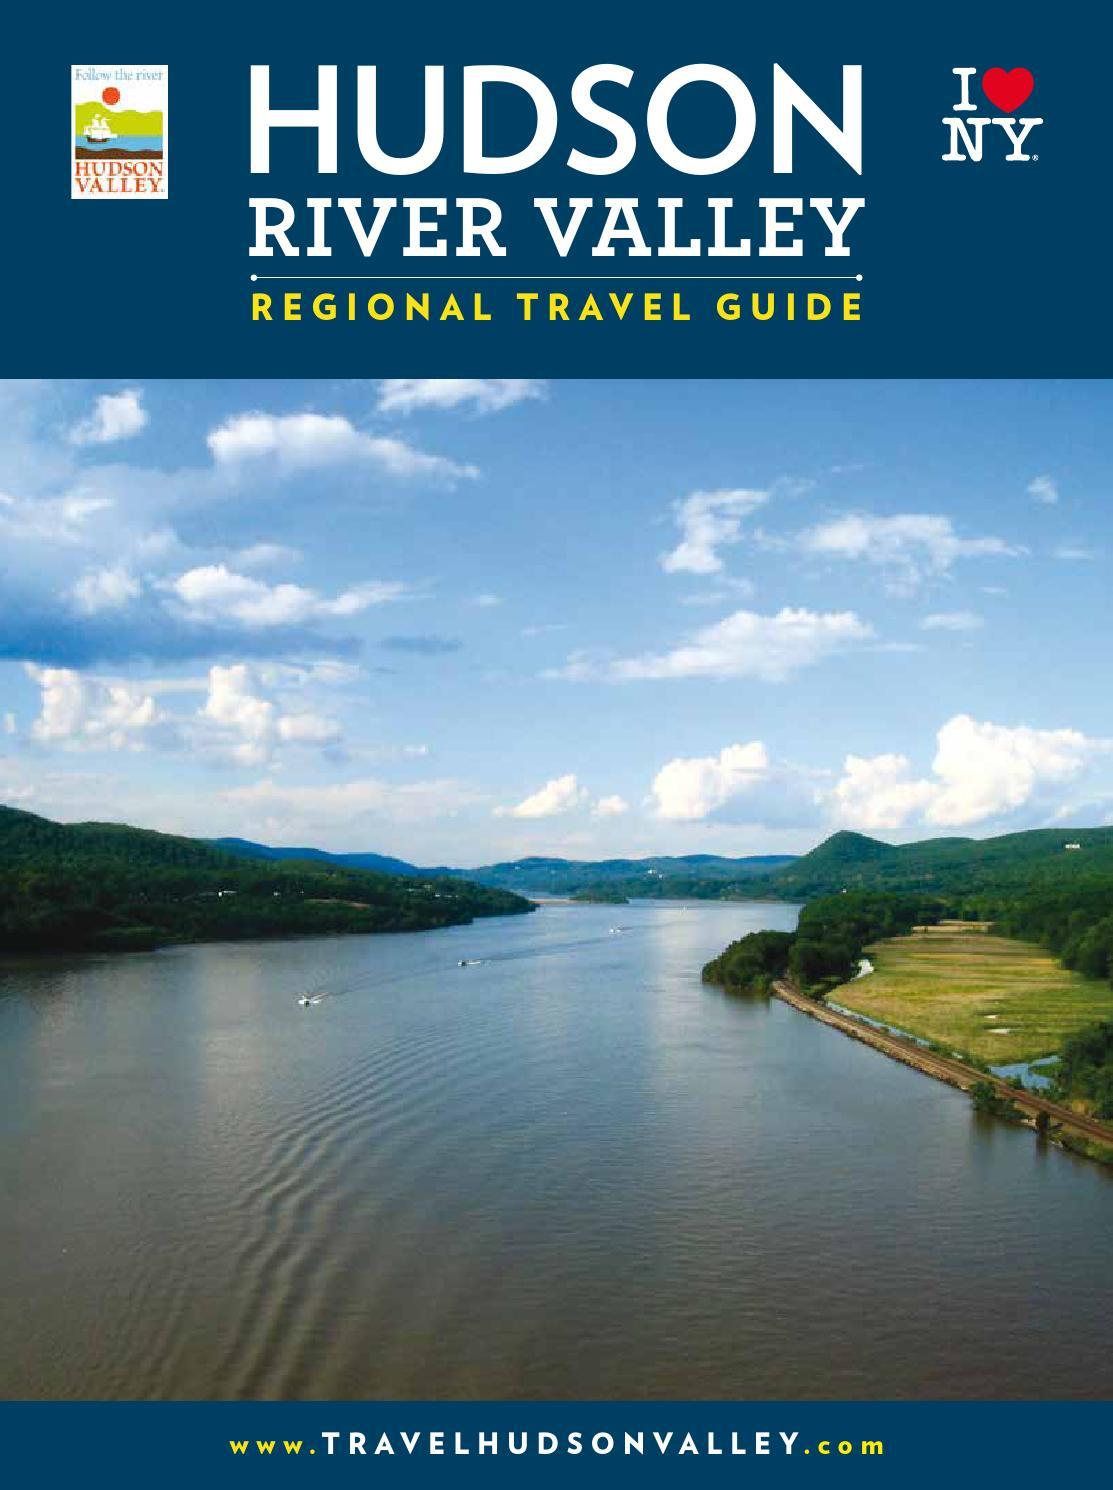 2012 Hudson River Valley Regional Travel Guide by Luminary Media - issuu